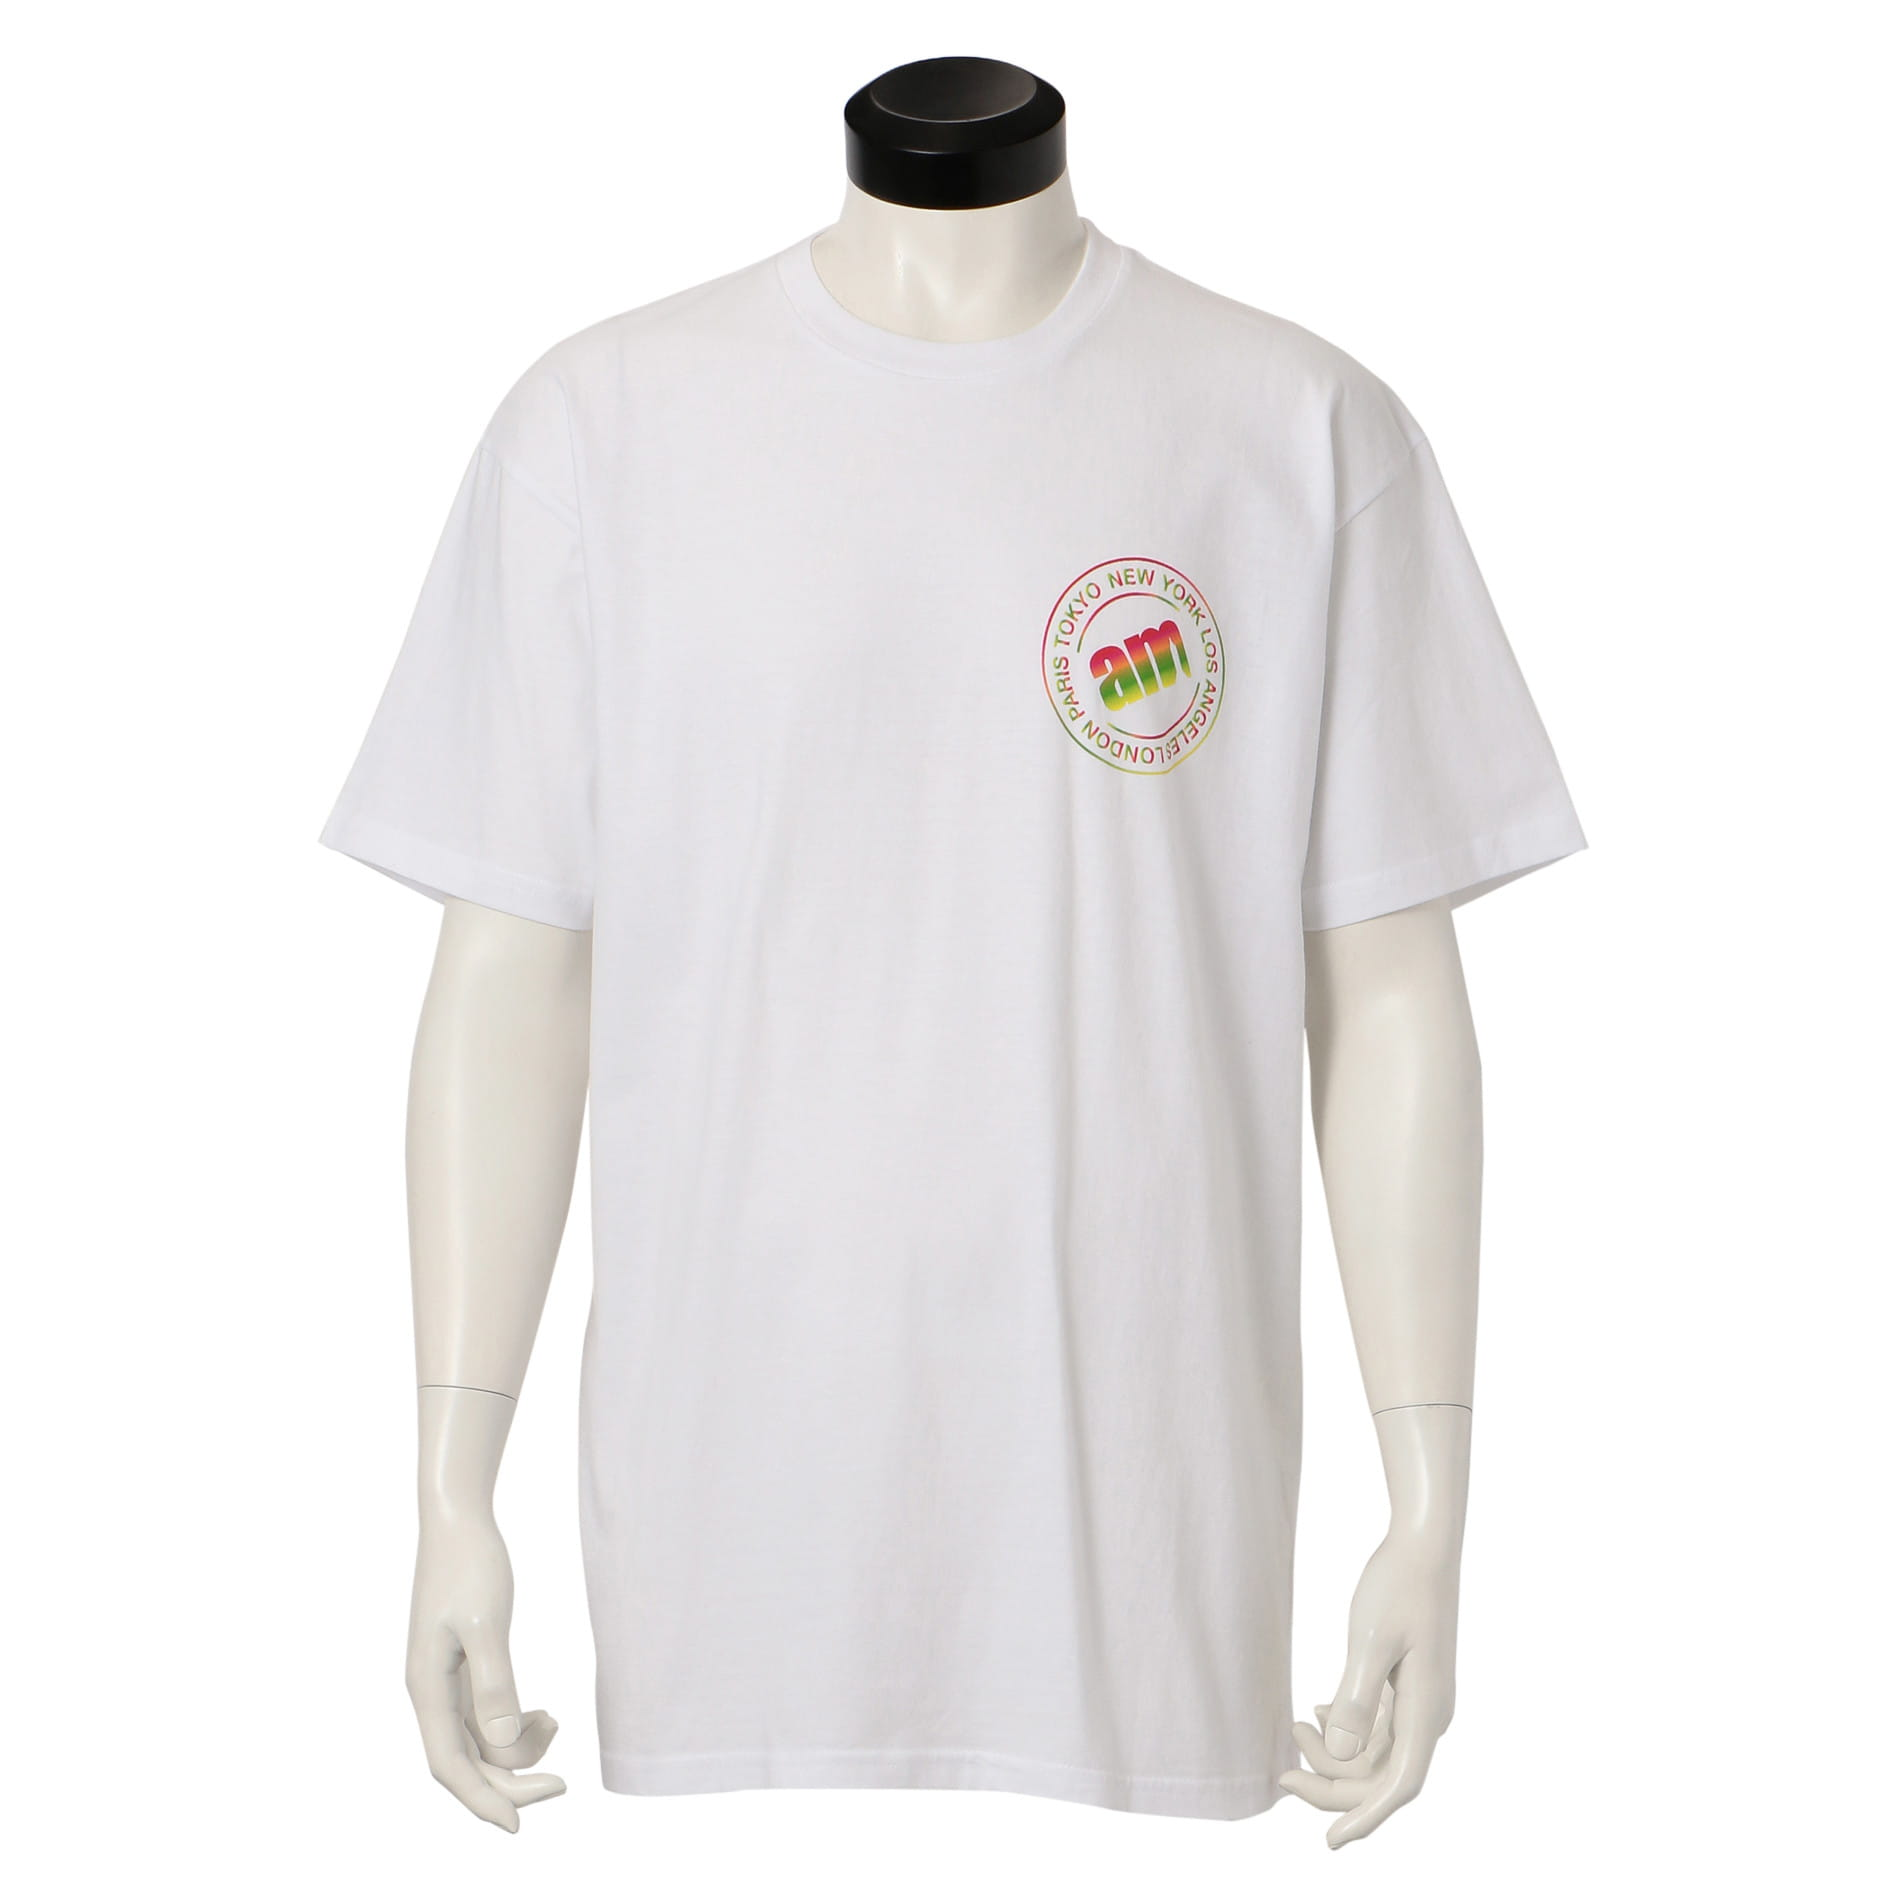 【am(AfetrMidnight)】MEN Tシャツ SS19-TS012